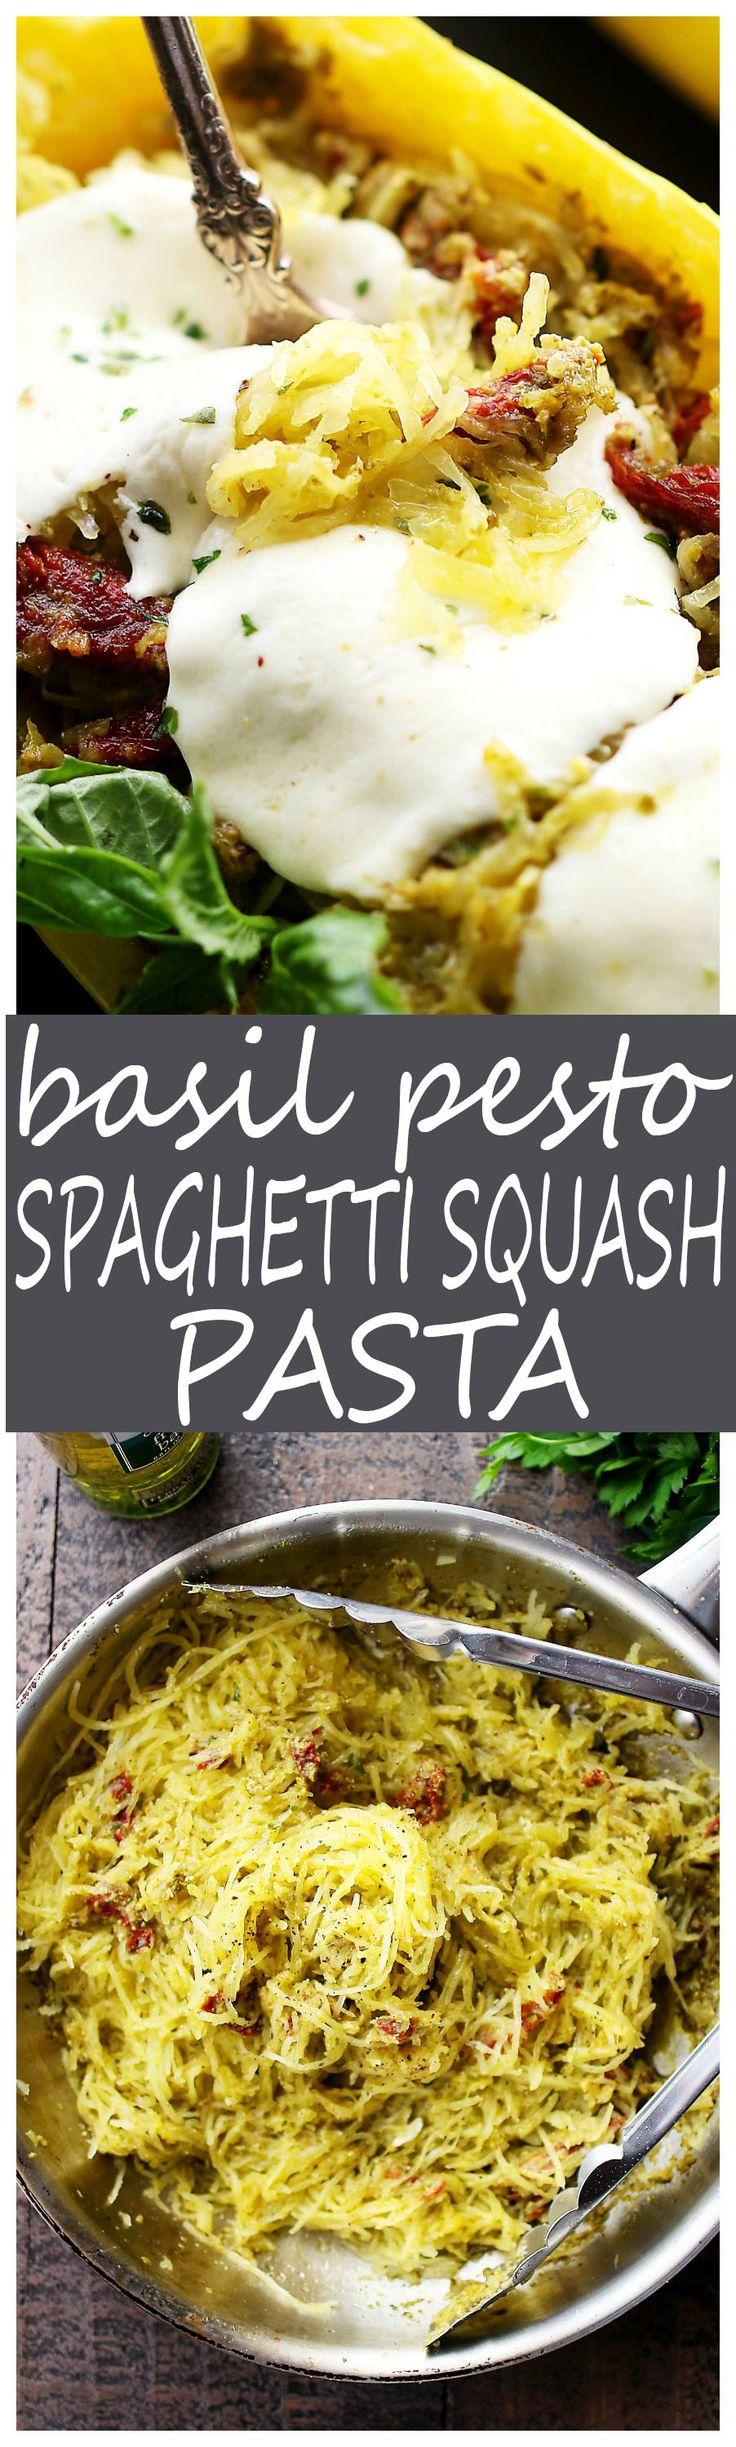 Basil Pesto Spaghetti Squash Pasta - An easy and healthy spaghetti squash pasta dinner tossed with basil pesto and sun dried tomatoes.